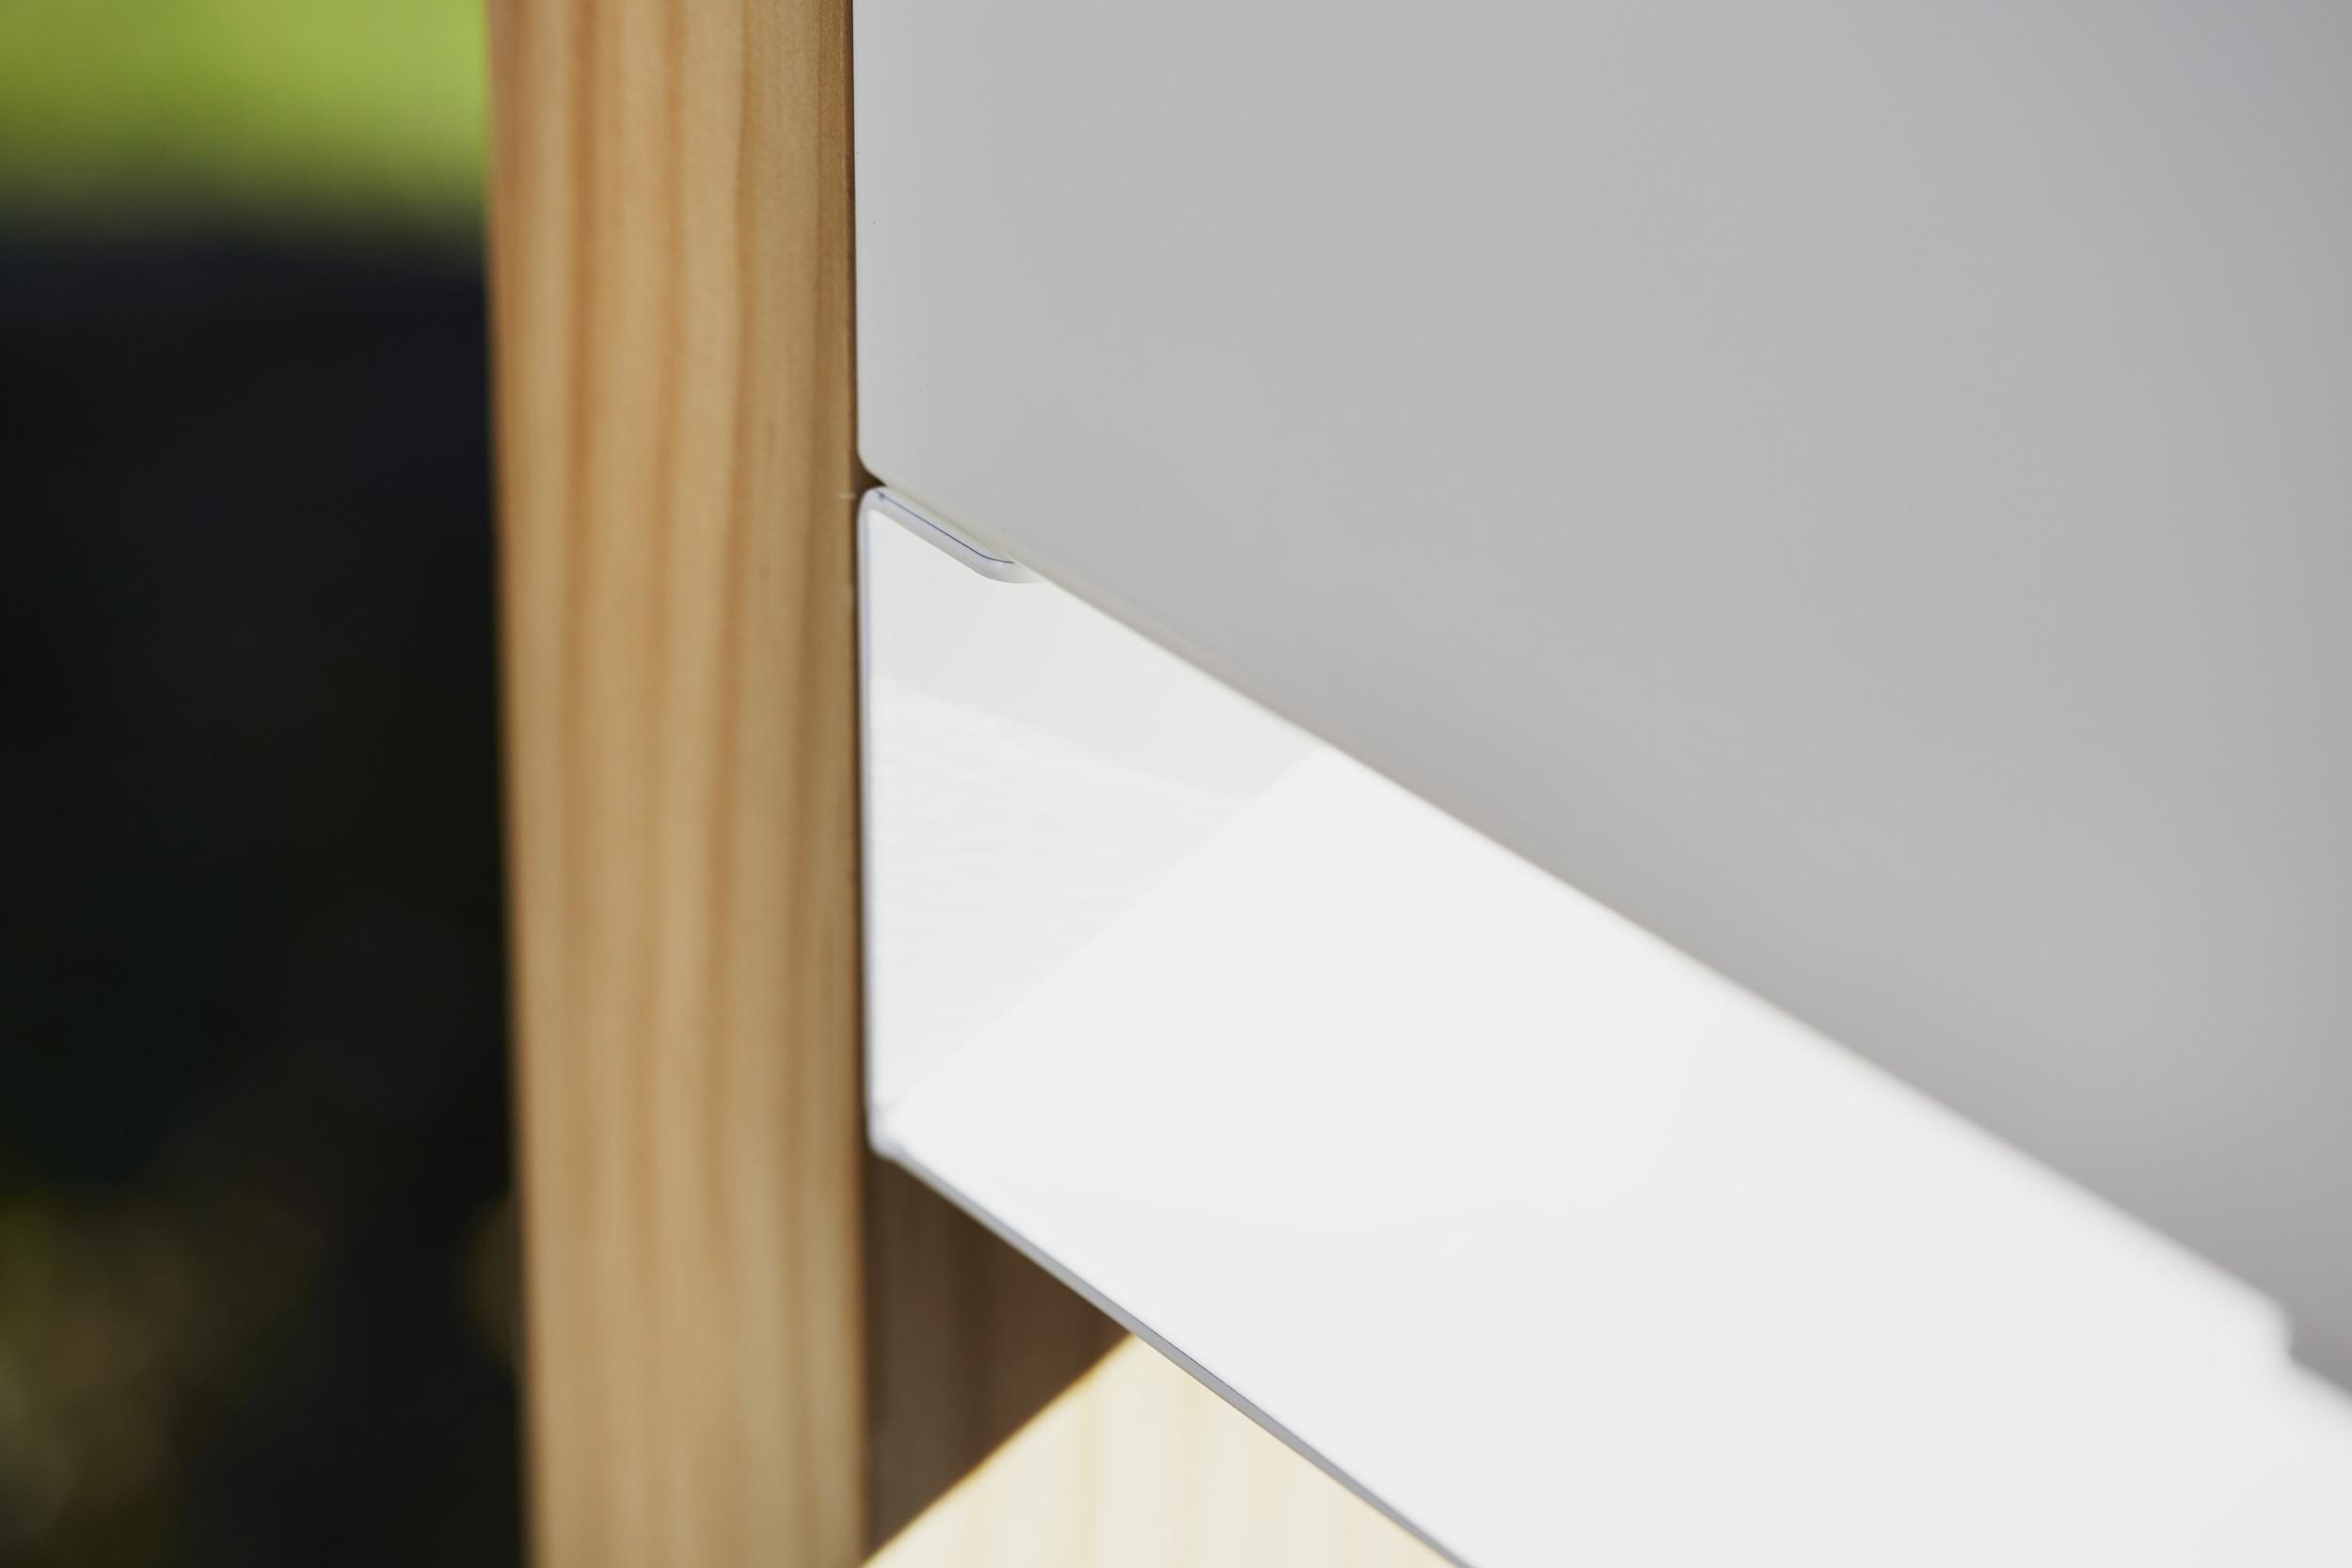 Timber Mailbox Designs